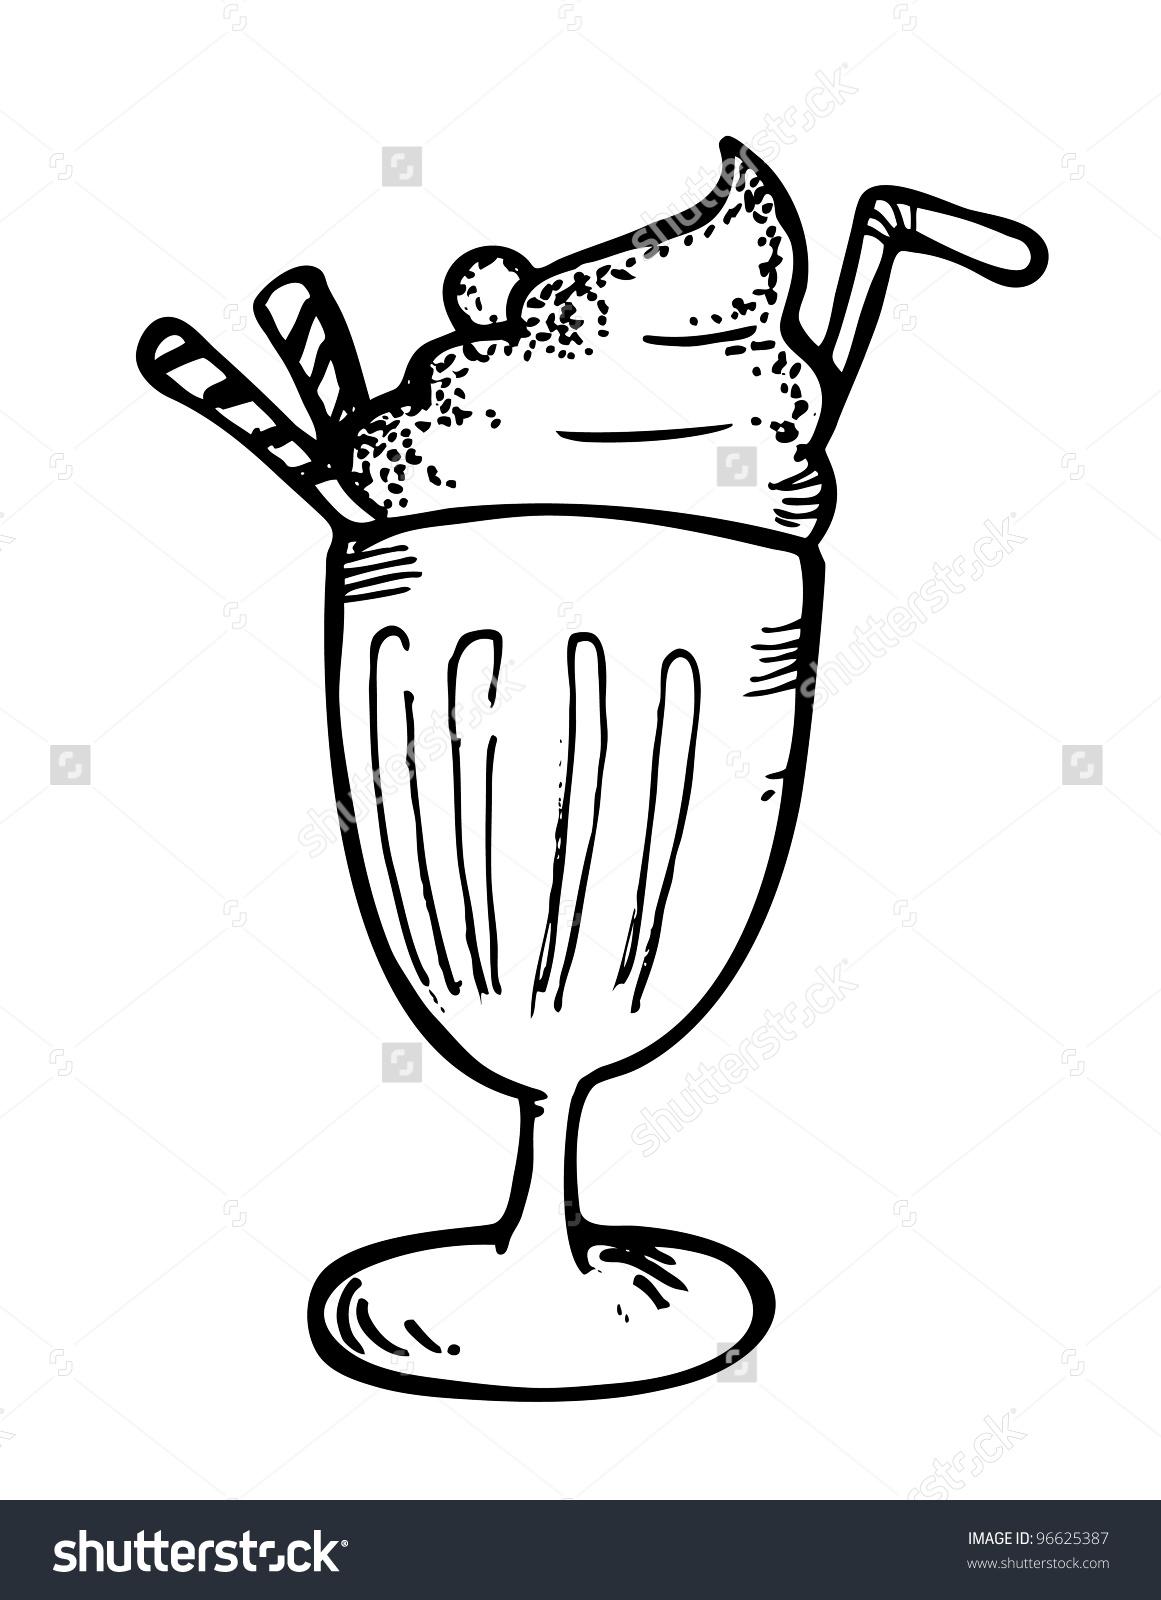 Malt clipart ice cream float Straw Ice Float cream 96625387